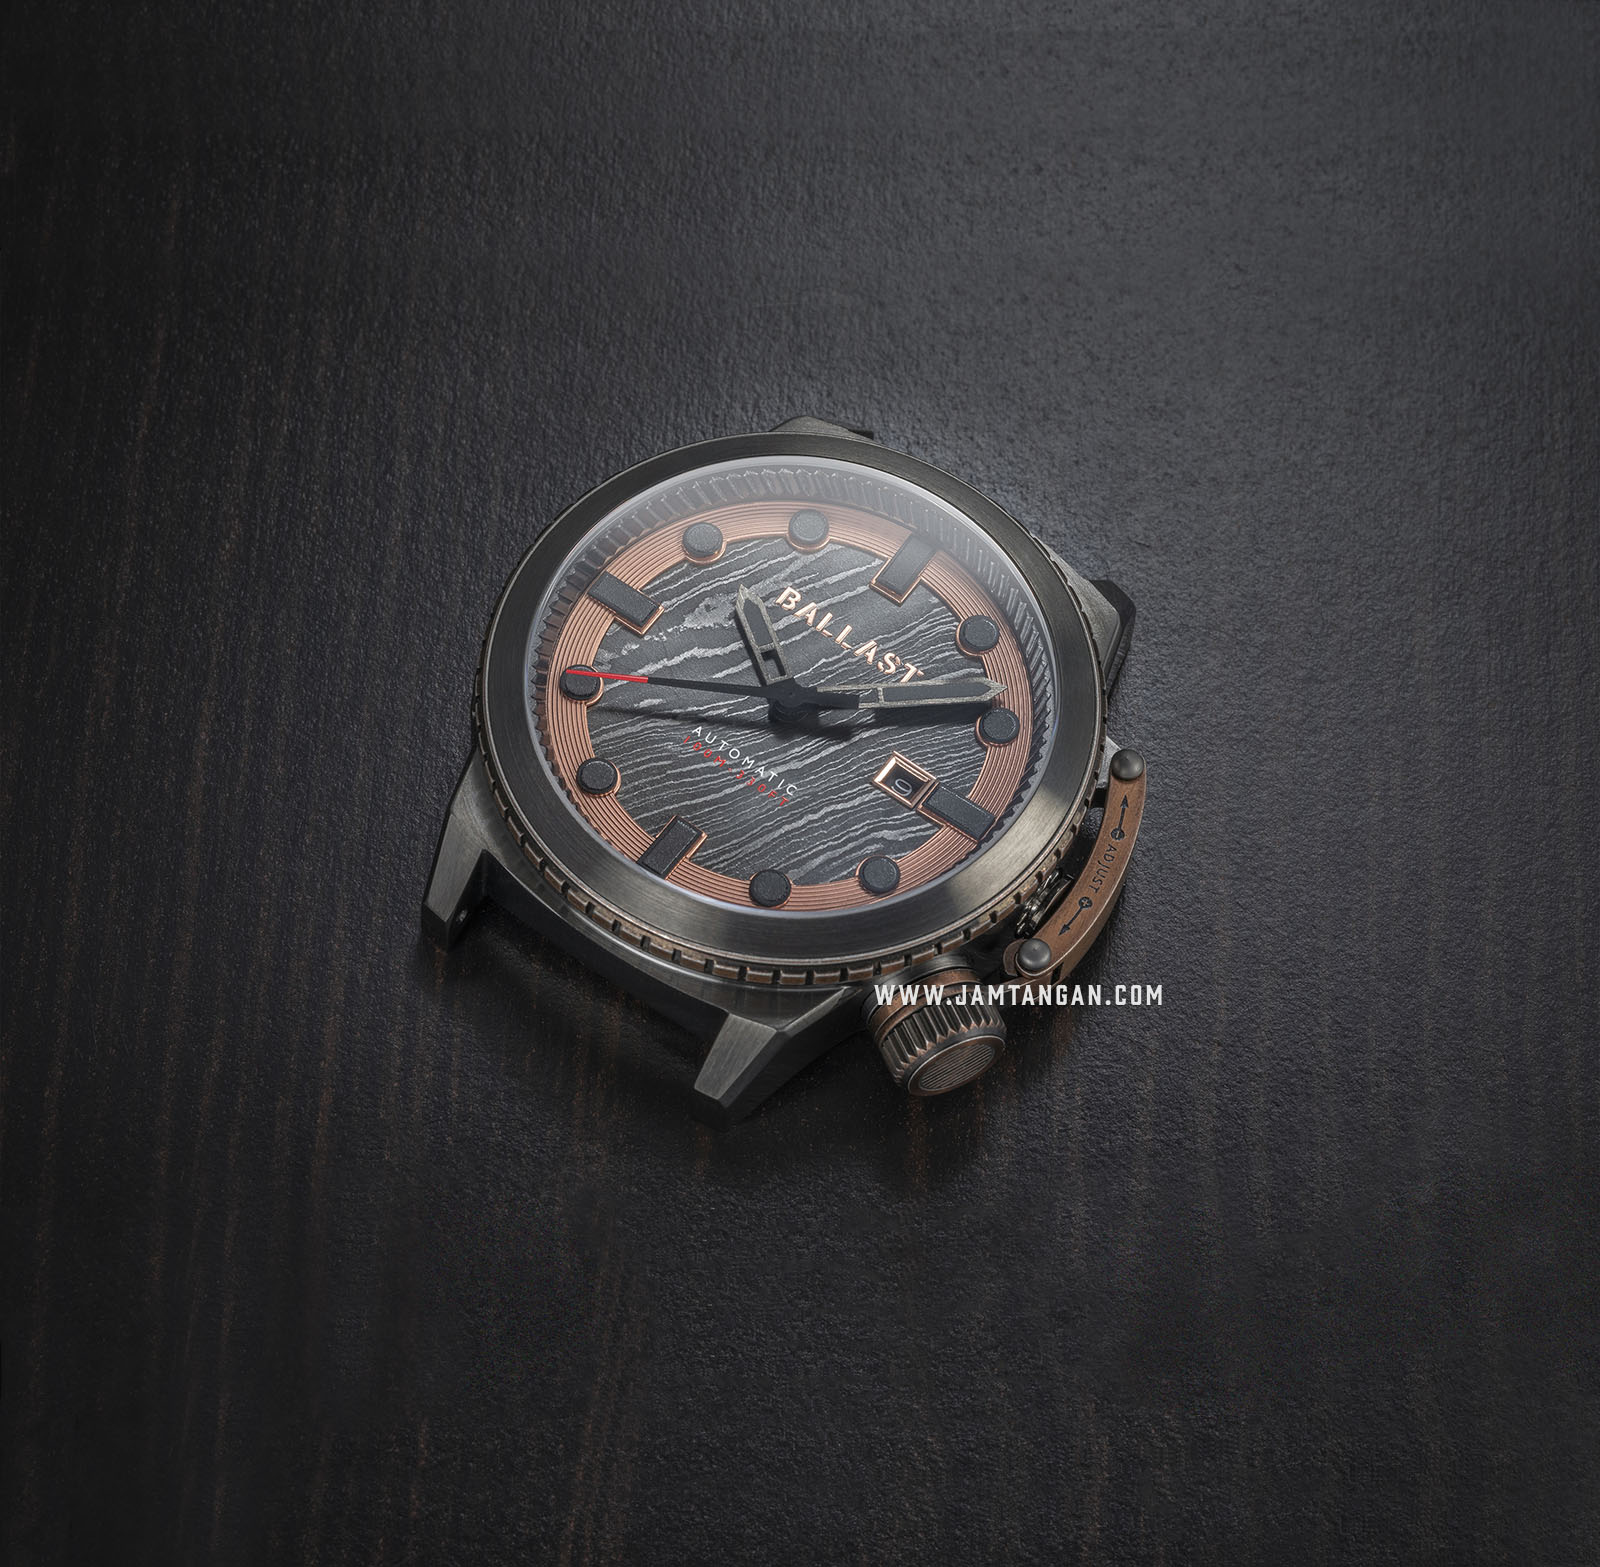 Ballast BL-3138-02 Trafalgar Triumph Men Damascus Rose Gold Dial Brown Leather Strap Machtwatch